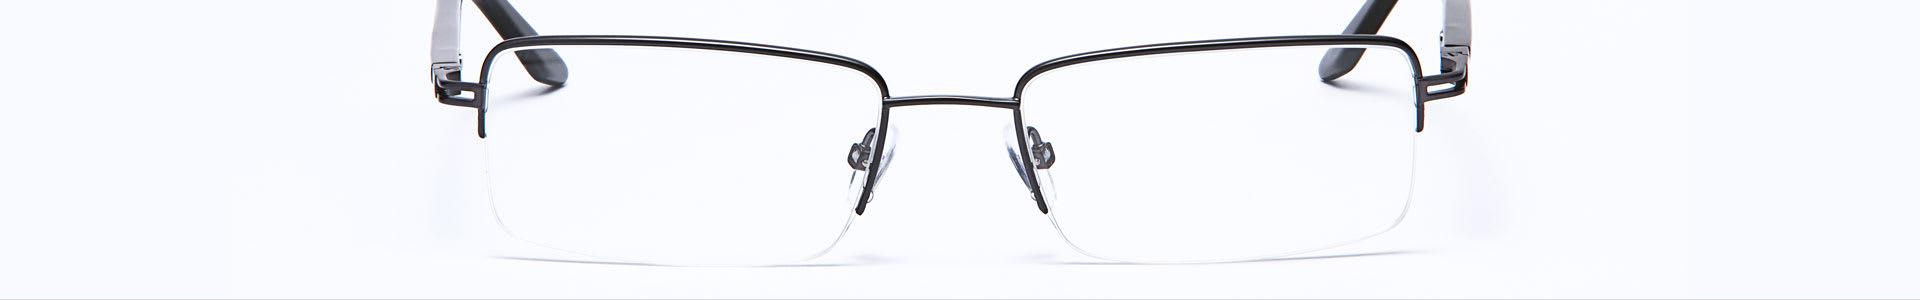 Titanium Frames for Eyeglasses & Sunglasses